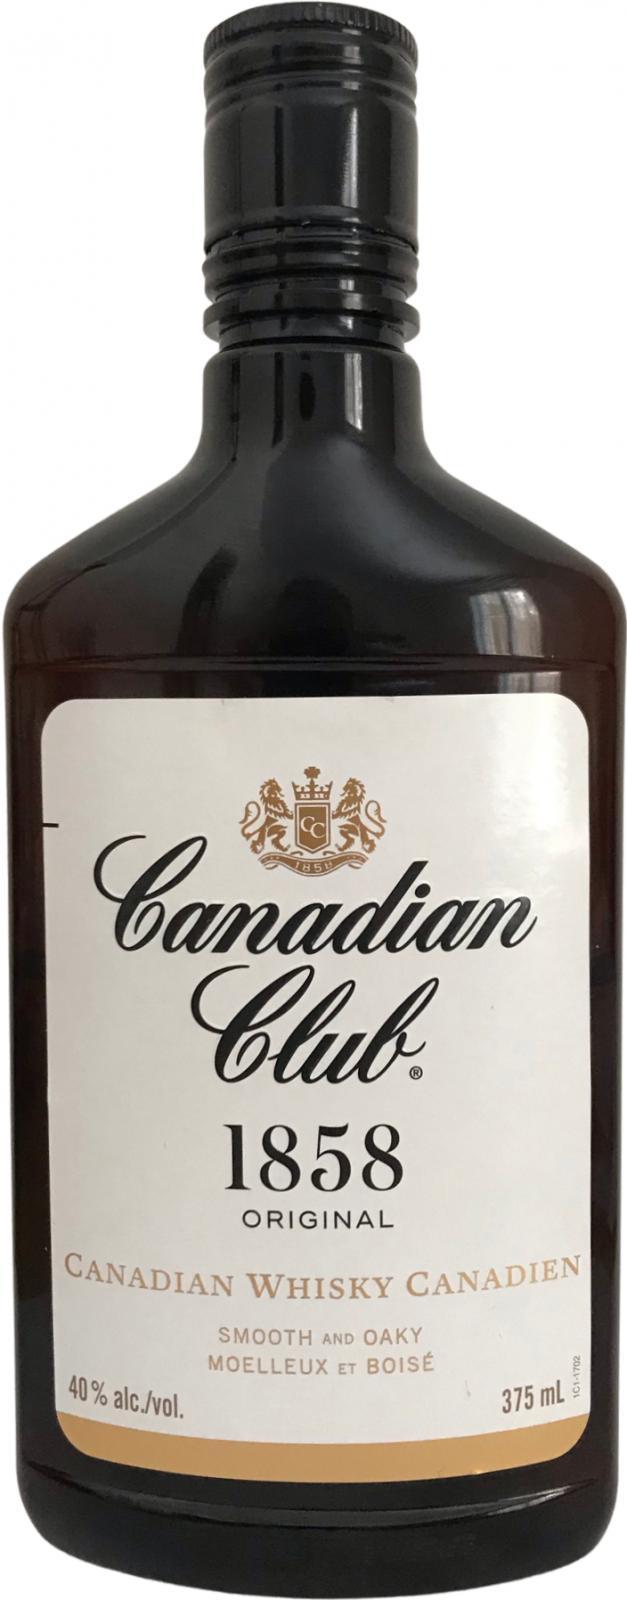 Canadian Club 1858 Original